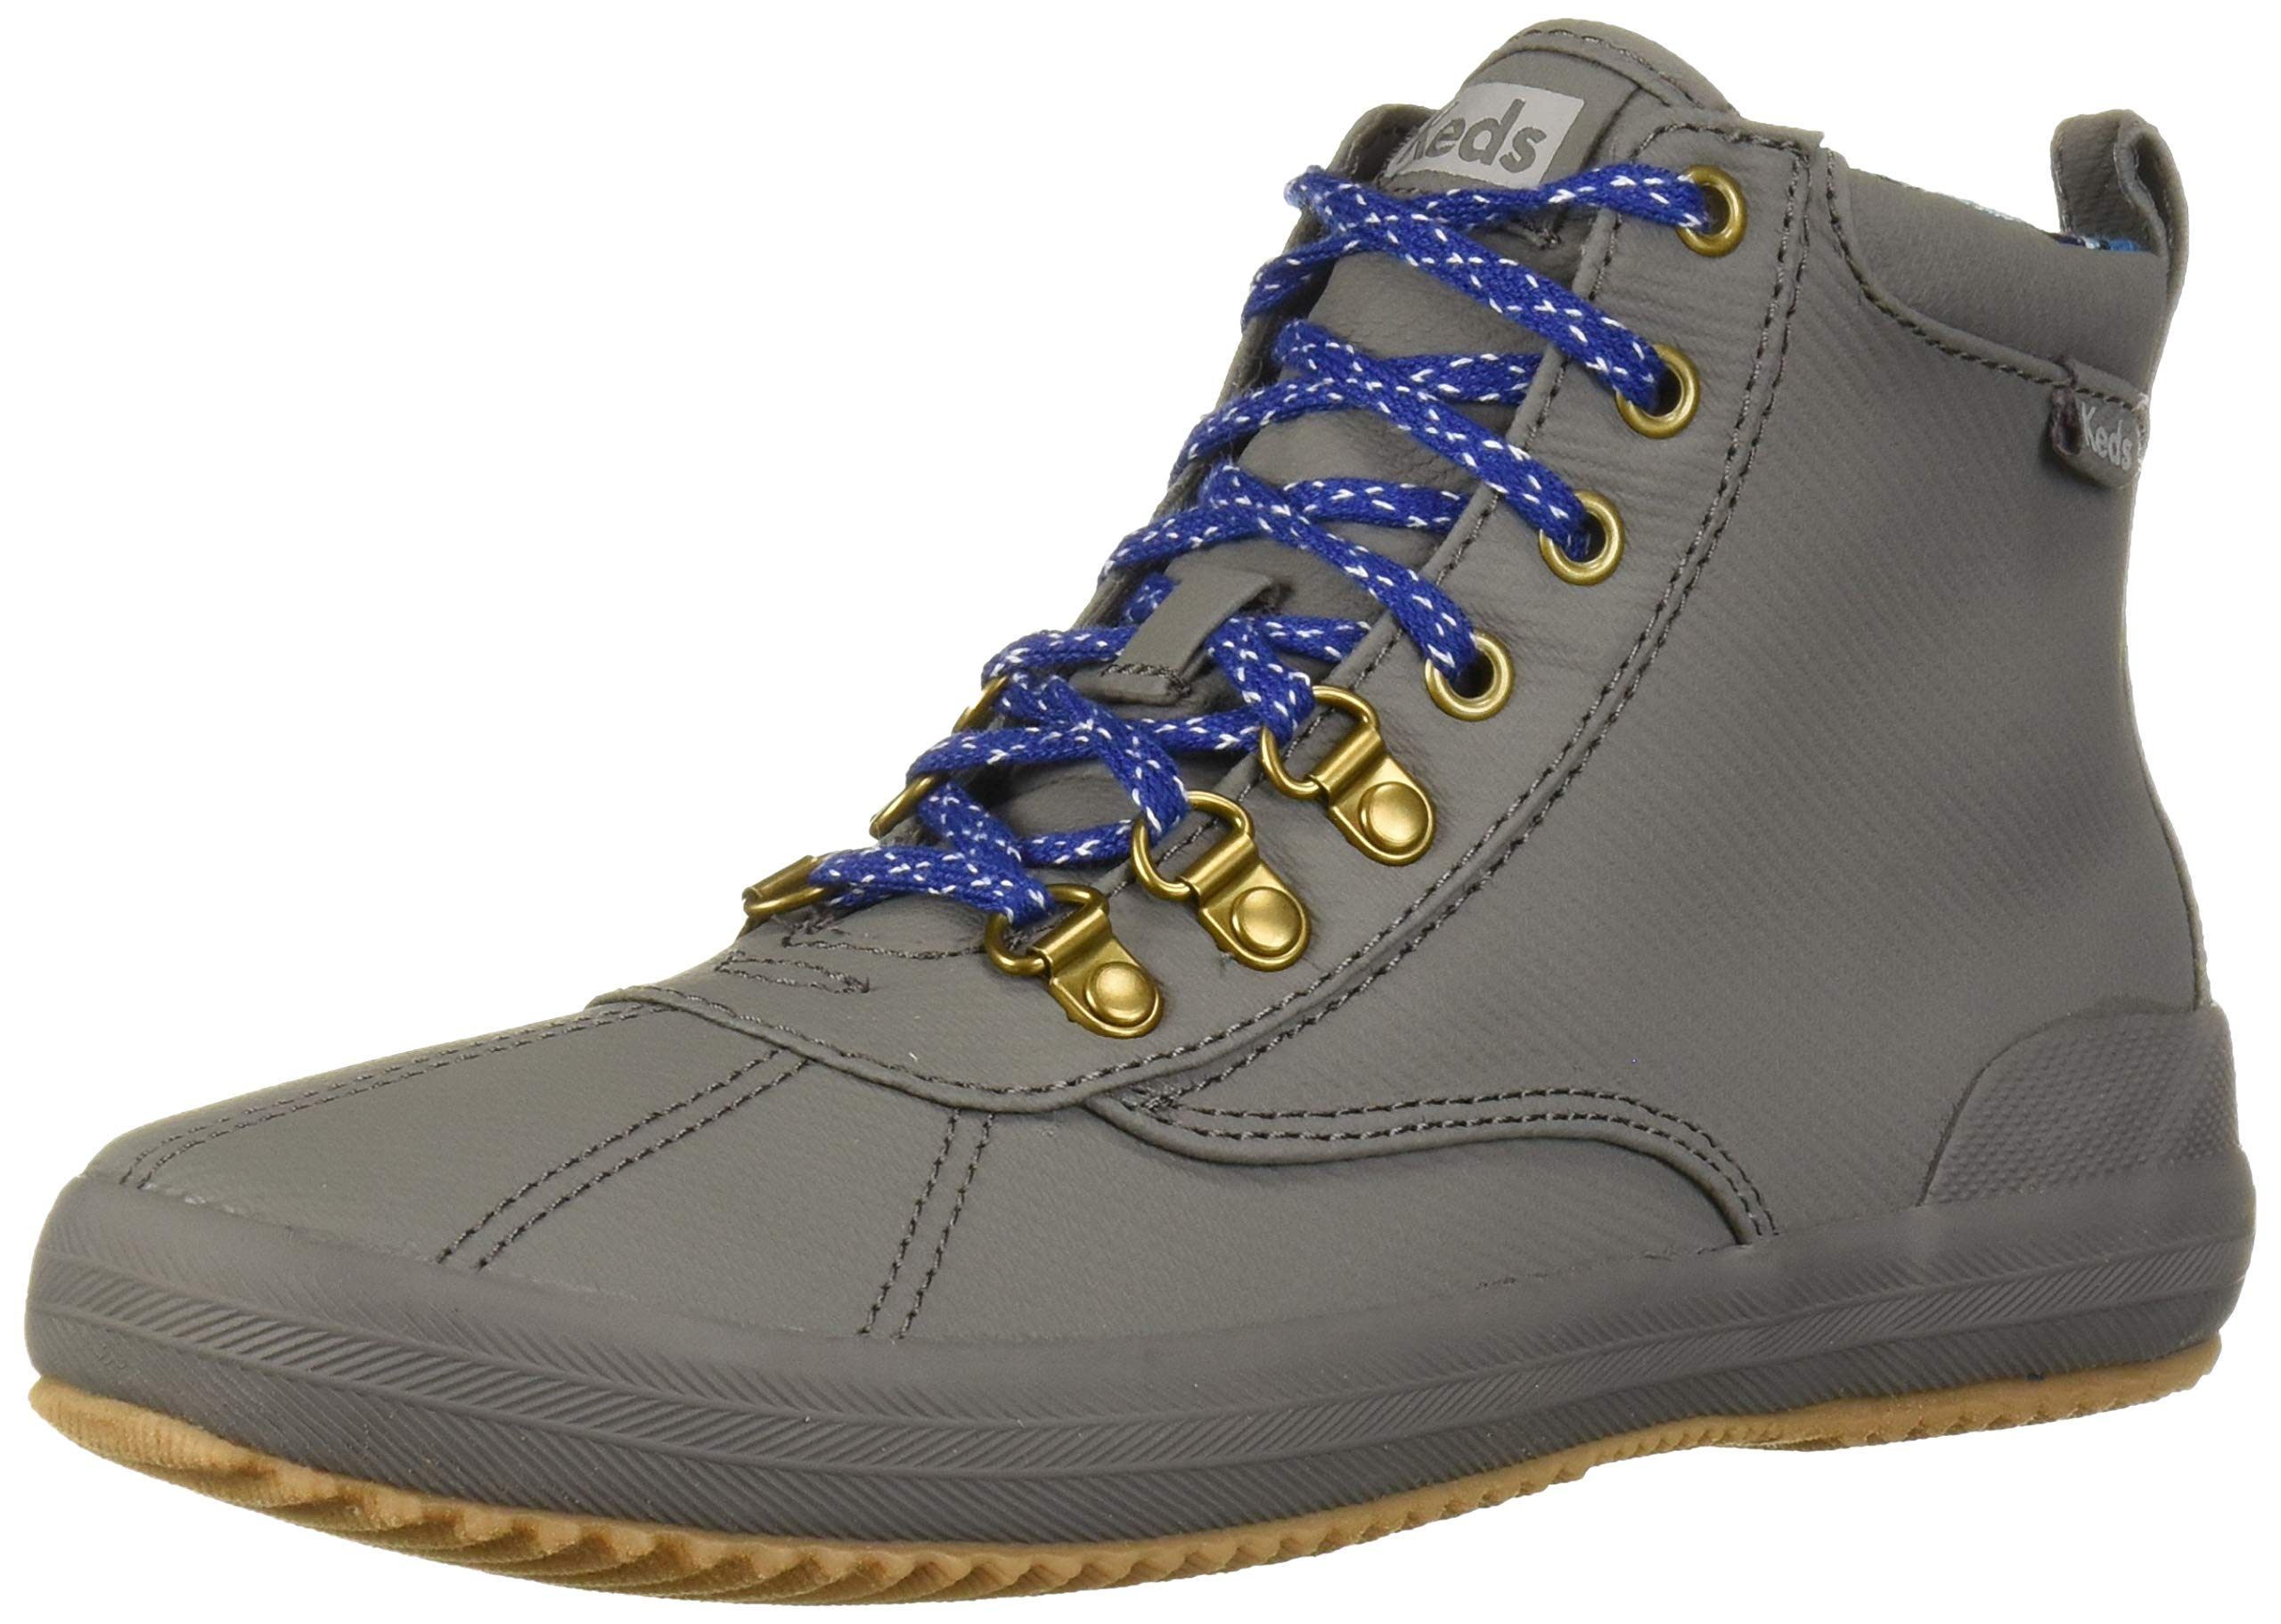 Keds Women's Scout Boot II Matte Twill Wx Rain, Gray, 10 Medium US by Keds